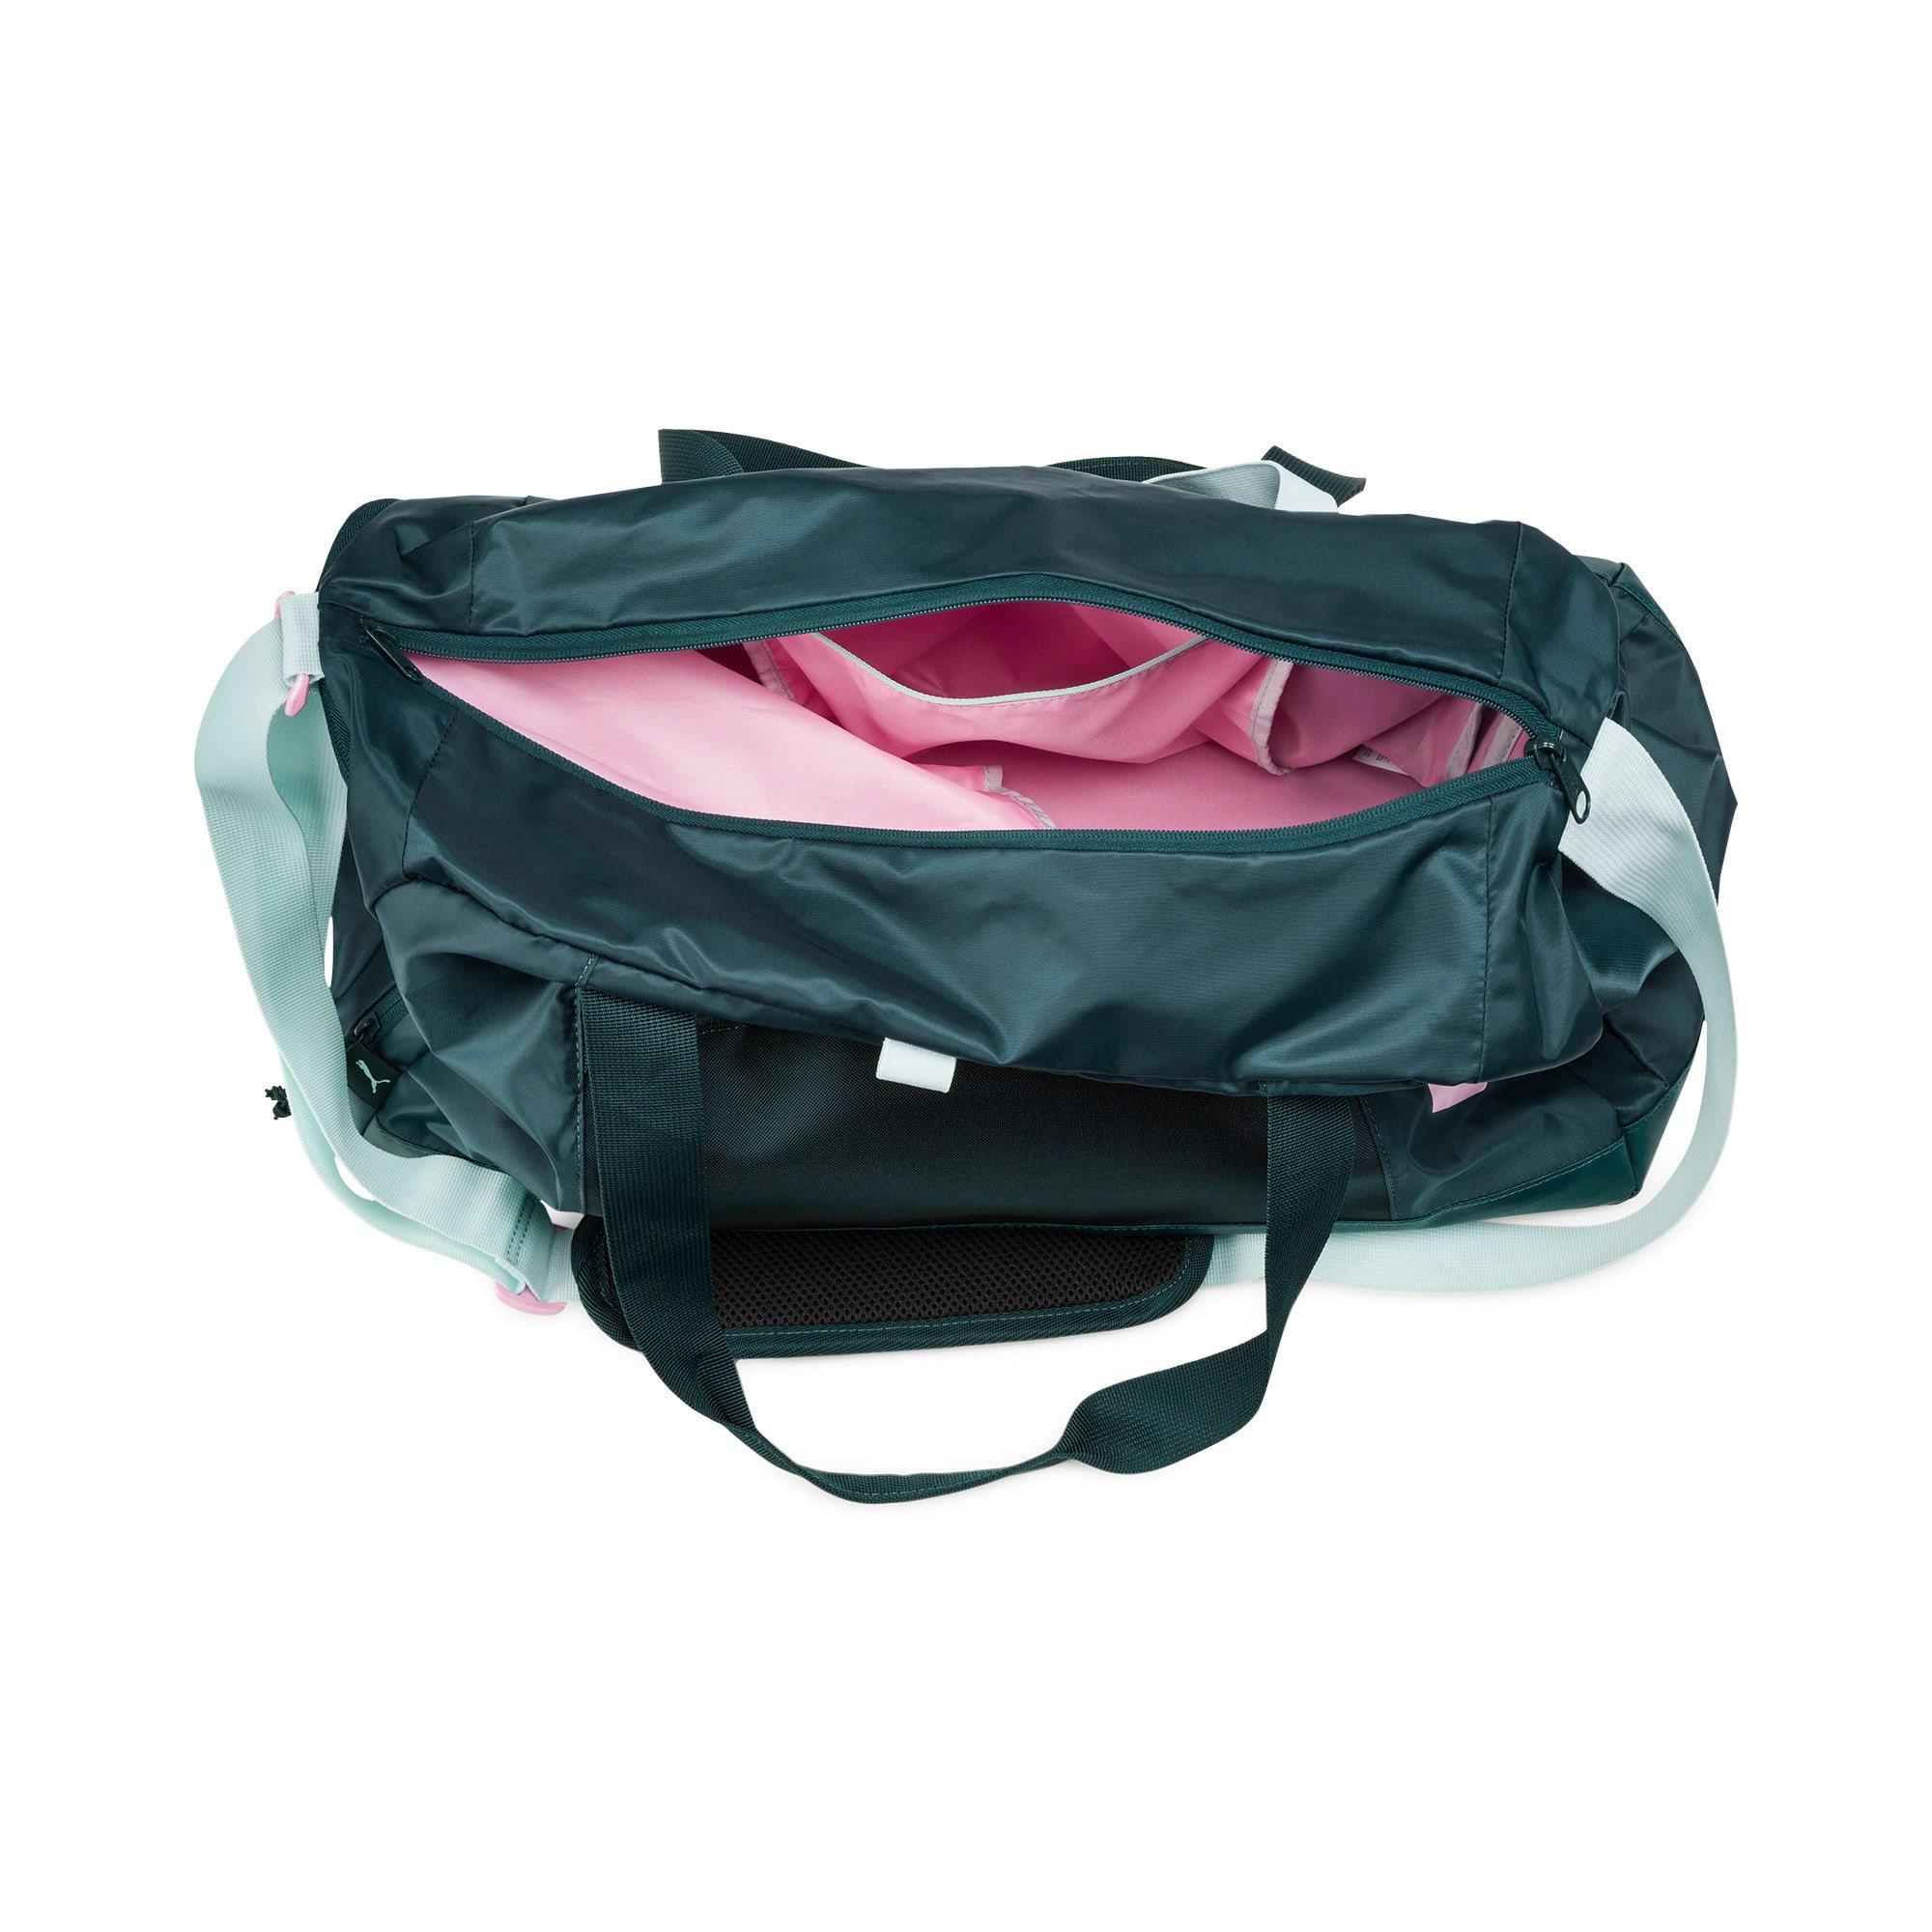 Thumbnail 4 of Active Women's Training Duffle Bag, Ponderosa Pine, medium